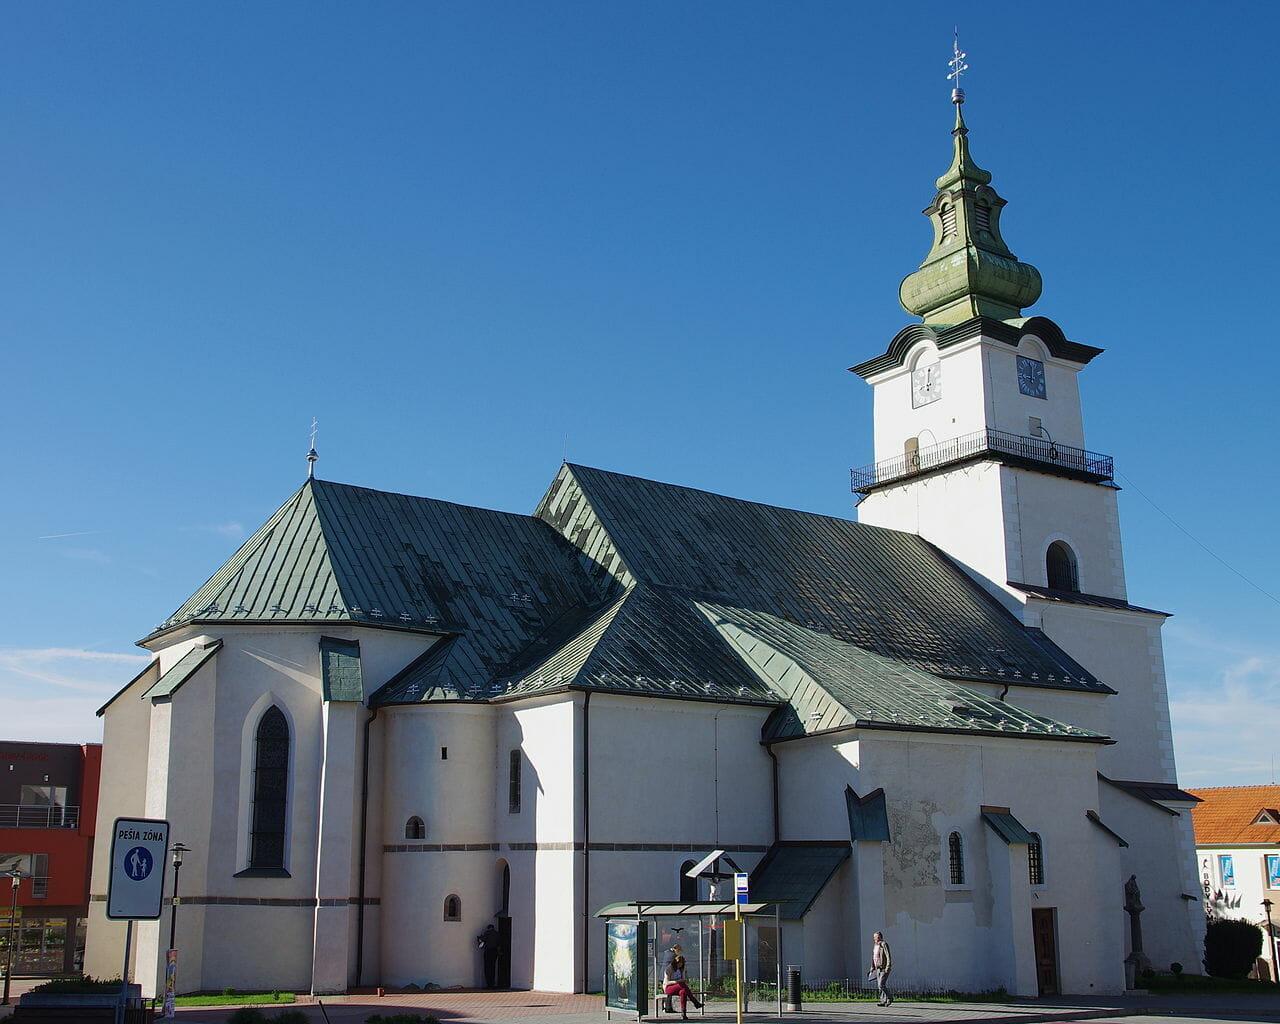 Kostol sv. Bartolomeja v Prievidzi (Farský kostol)